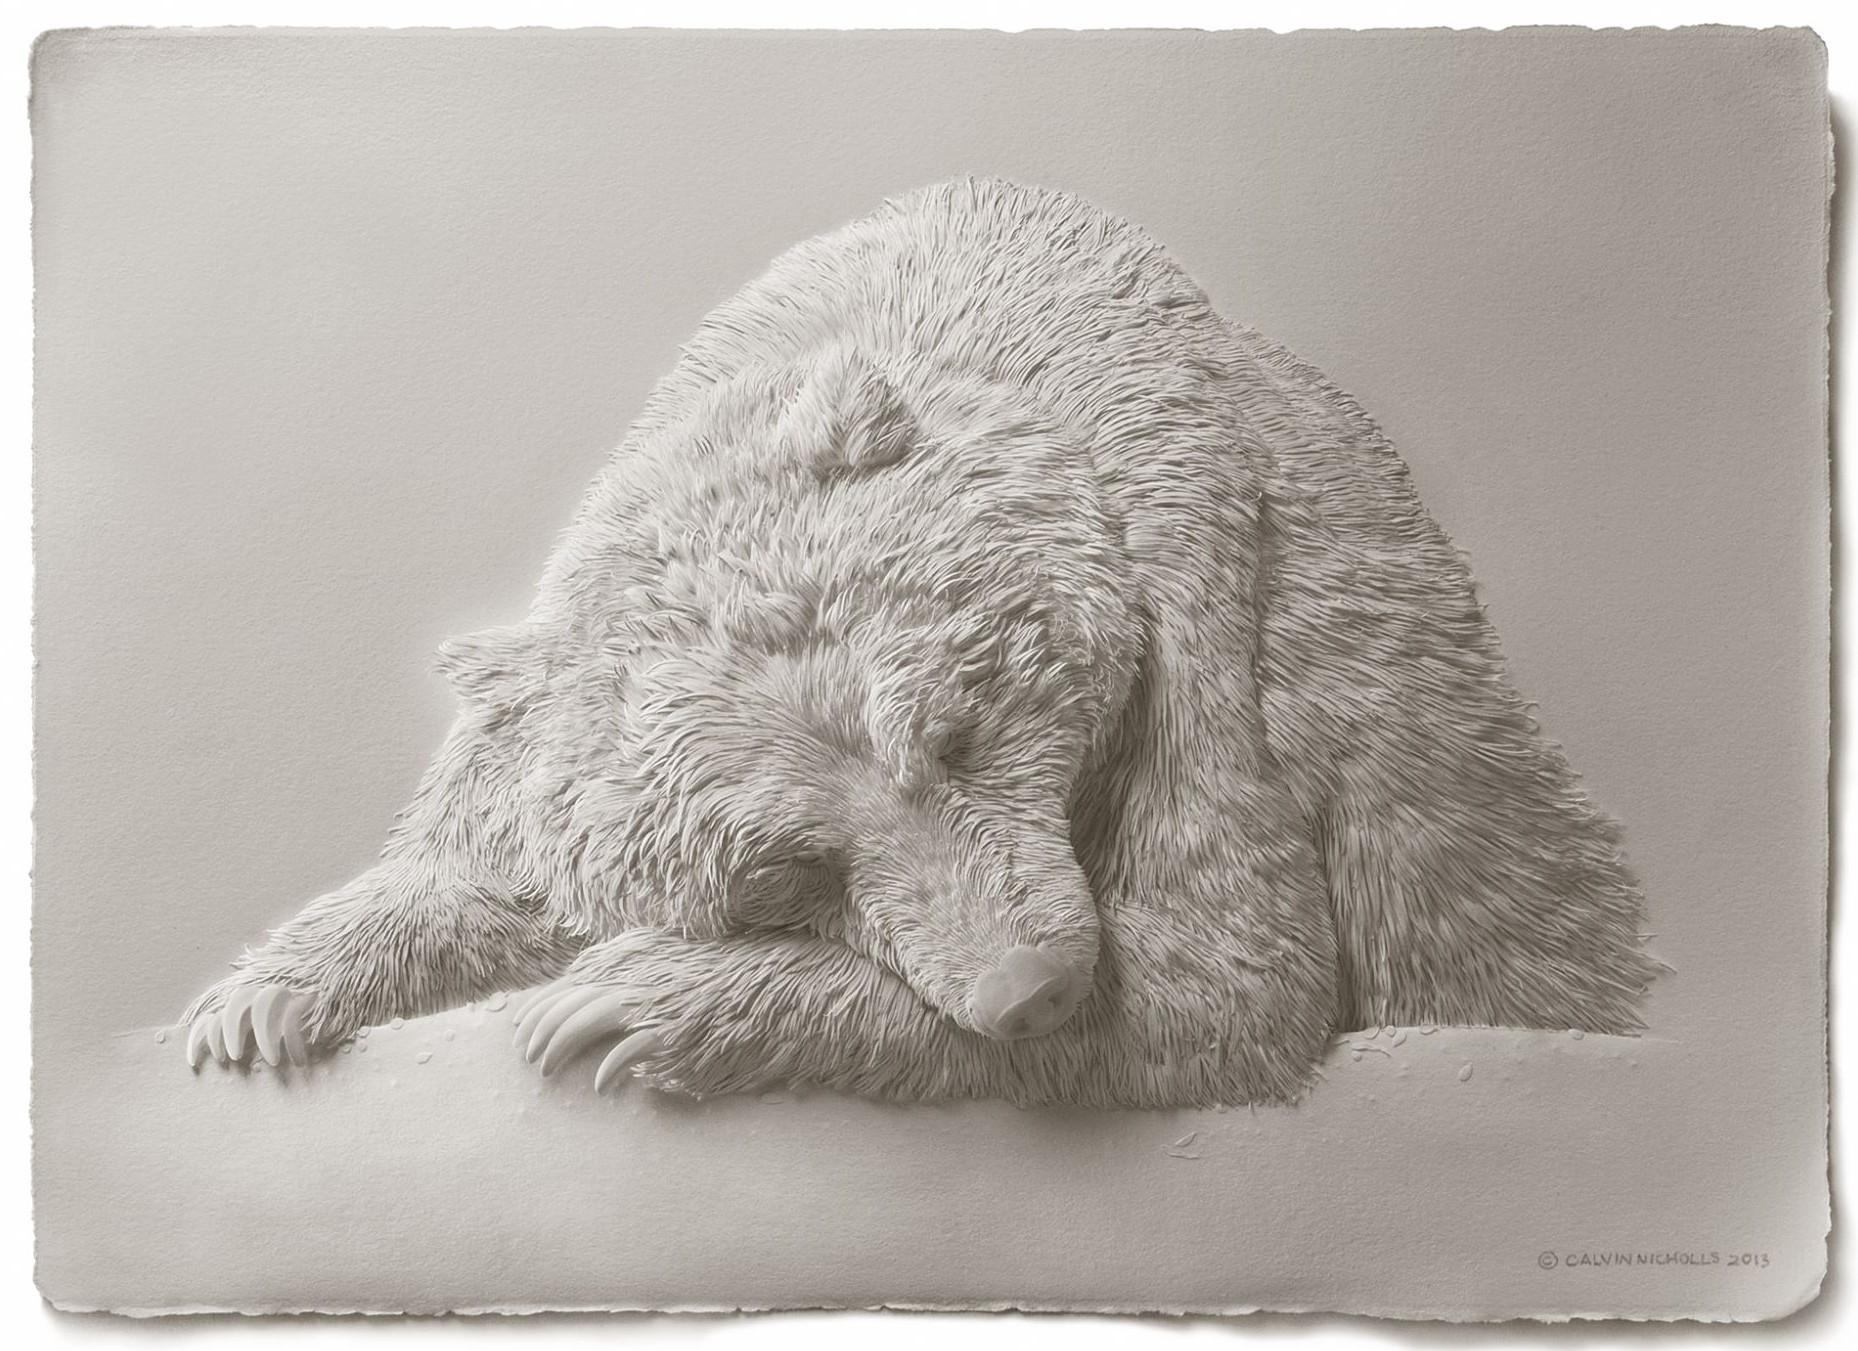 calvin nicholls incredibly detailed paper art